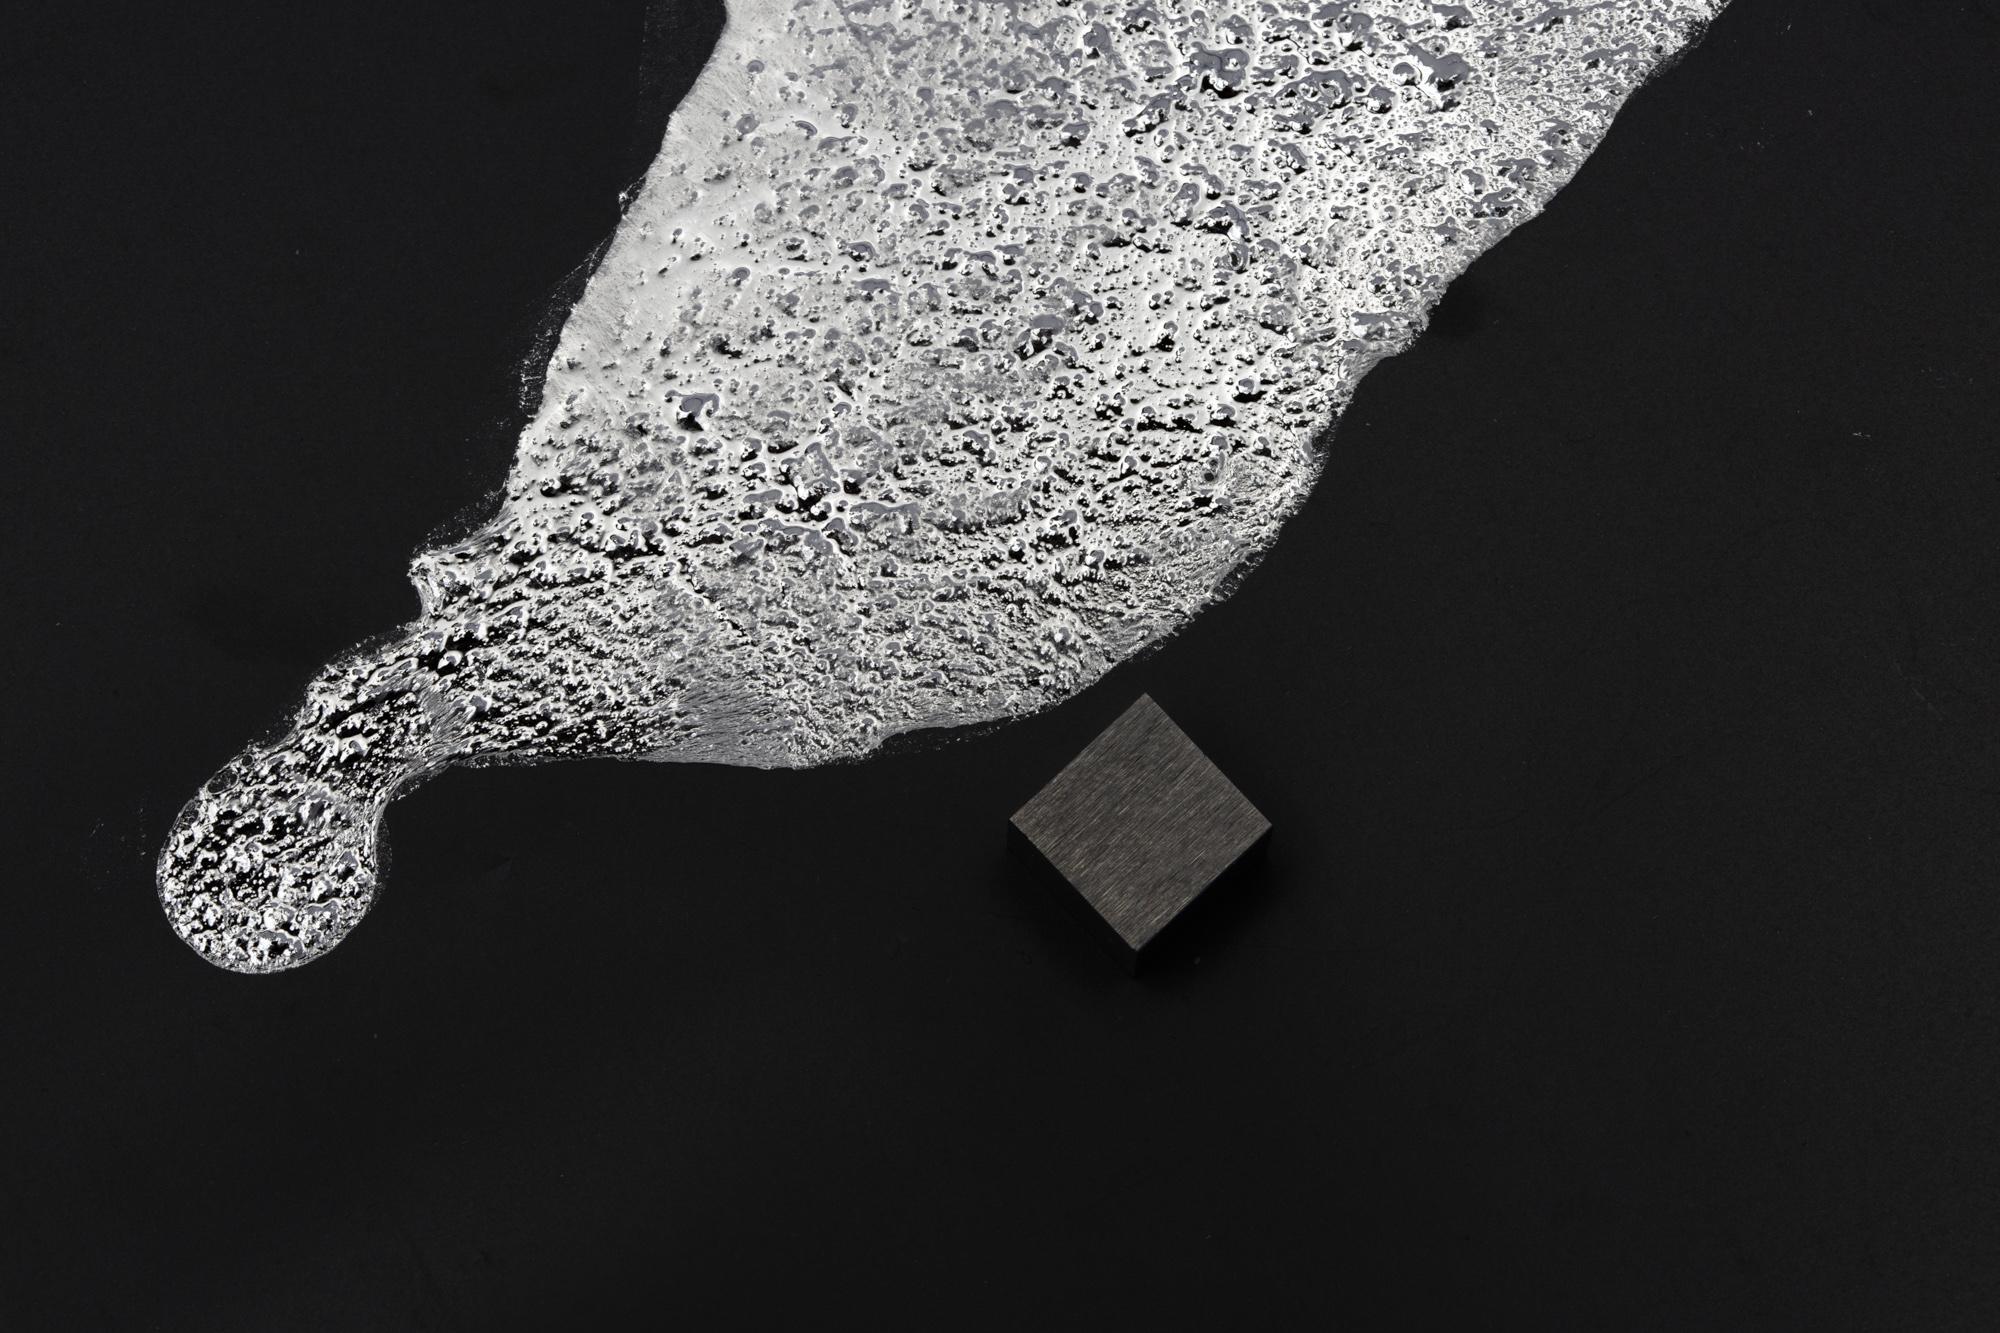 RRodenr-FMP-Digital matter-2.jpg